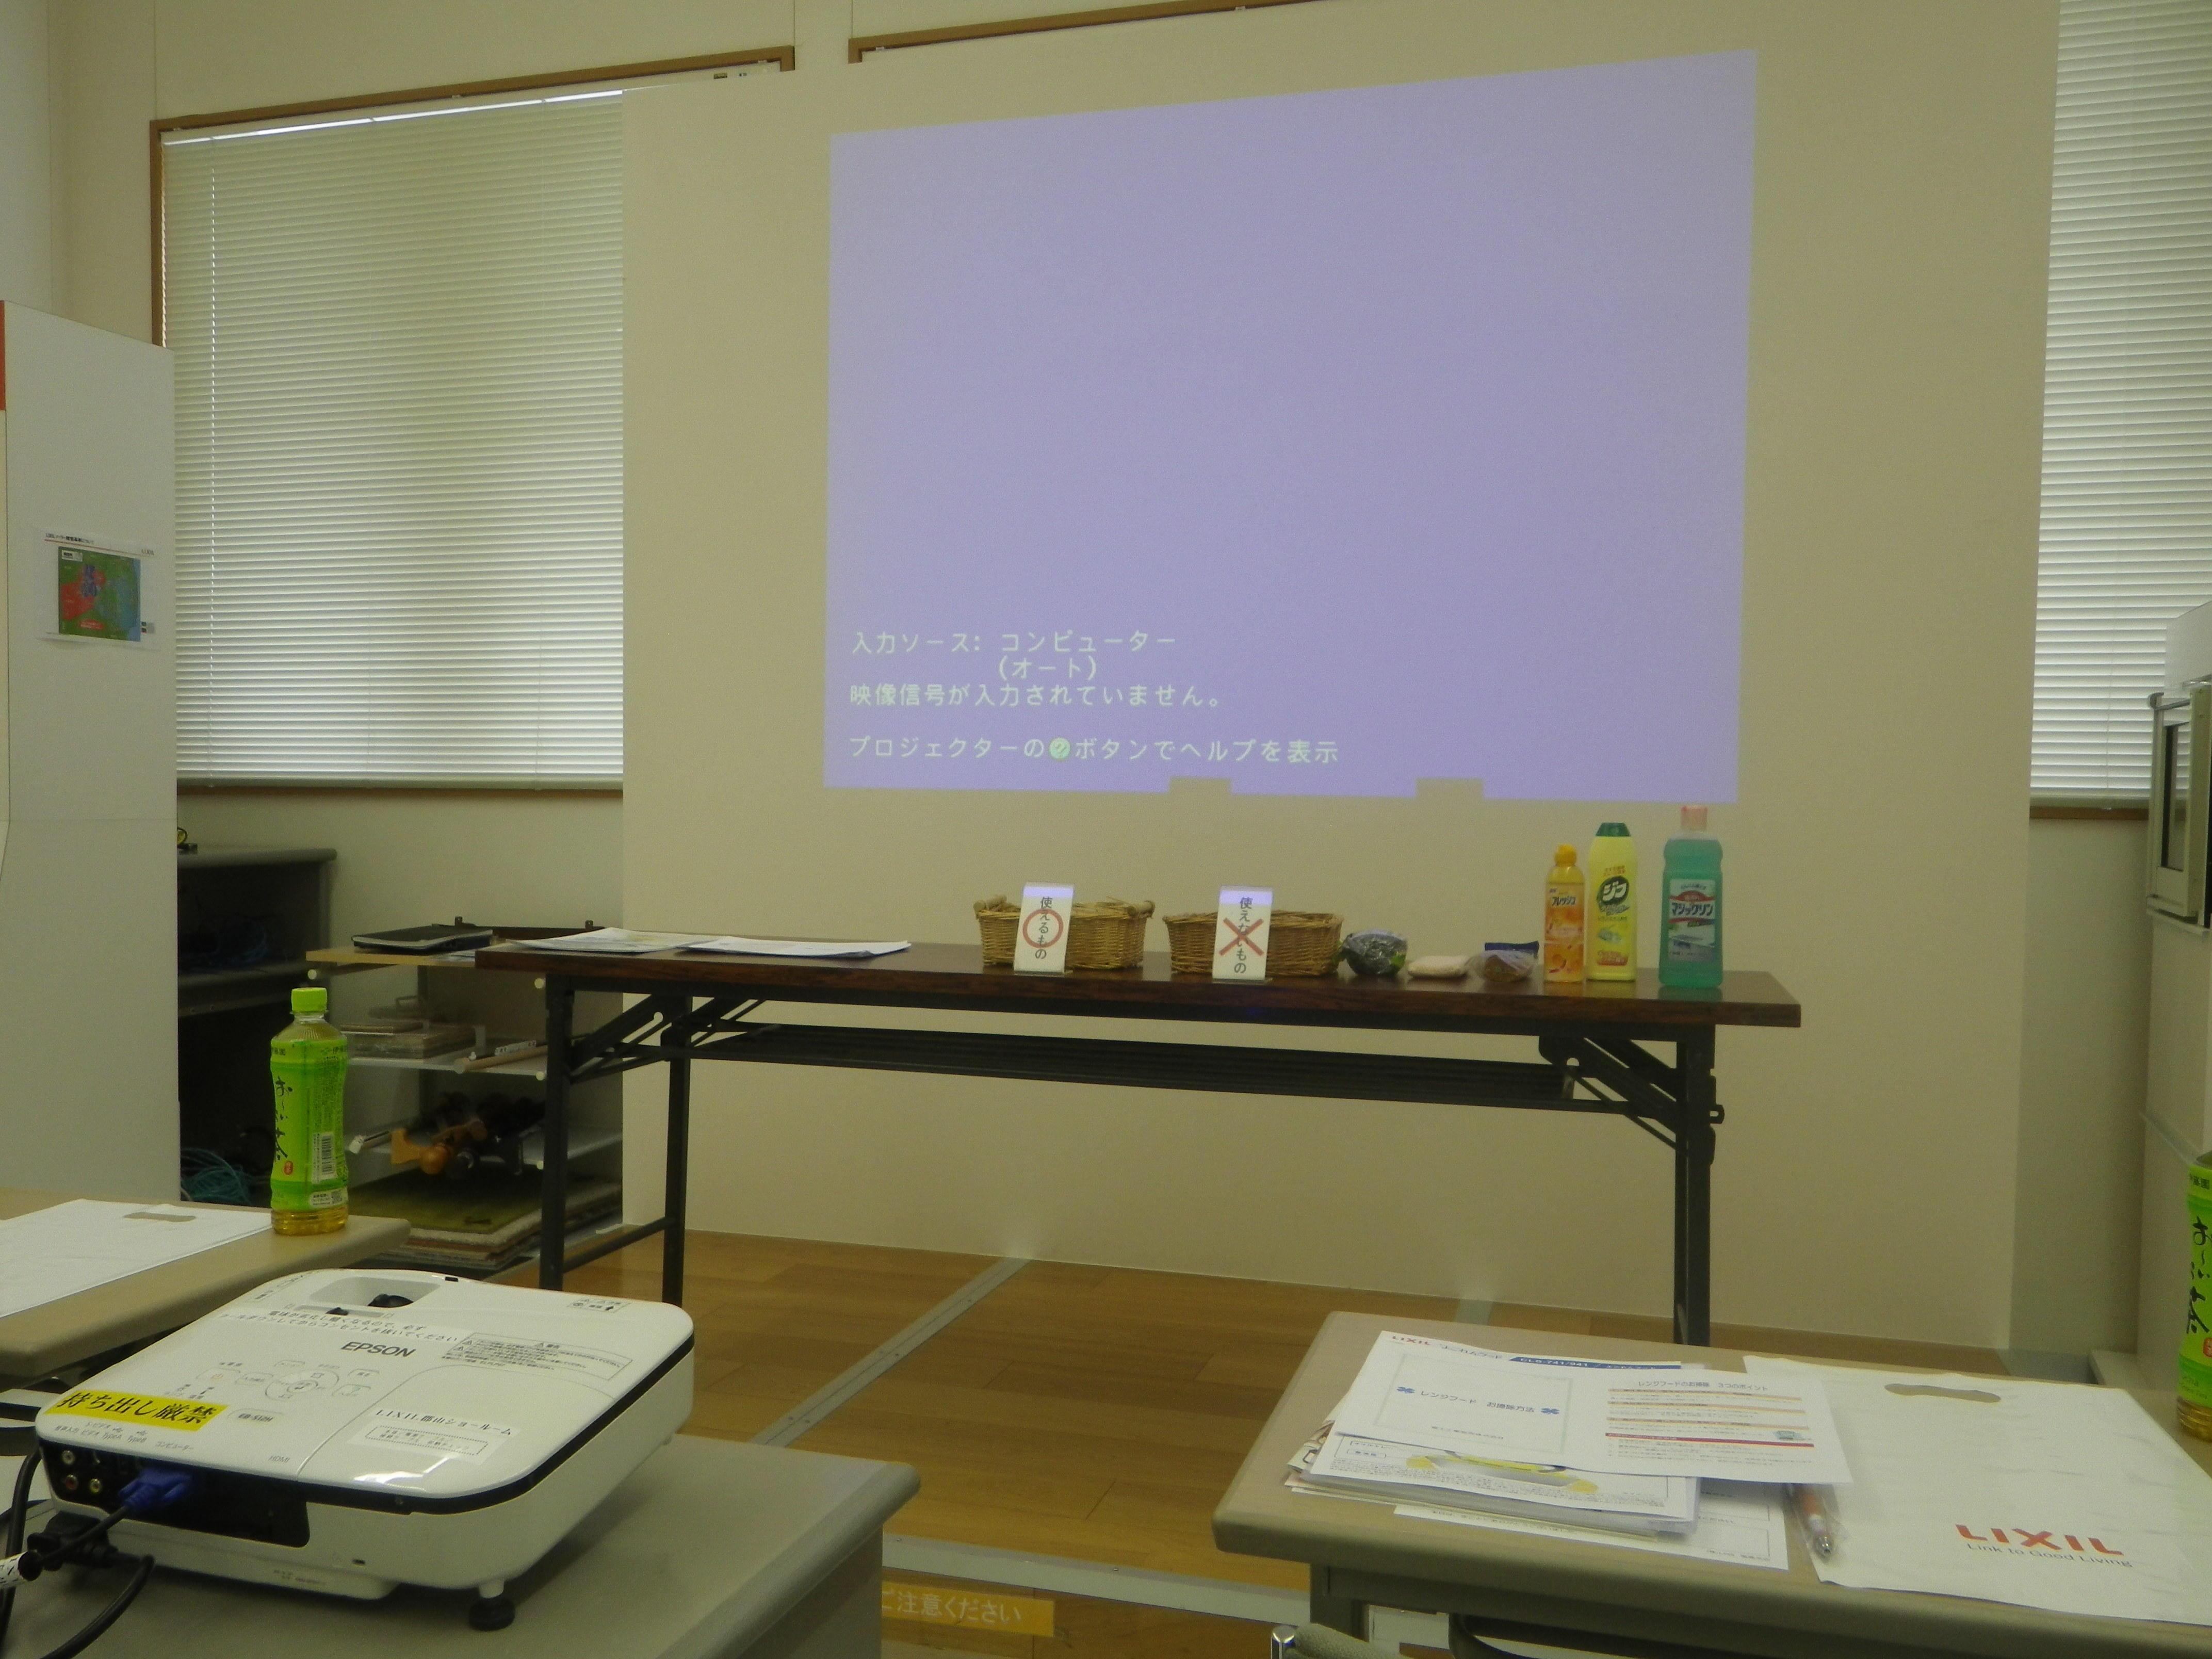 https://www.lixil-reformshop.jp/shop/SP00000505/photos/IMGP3880.JPG